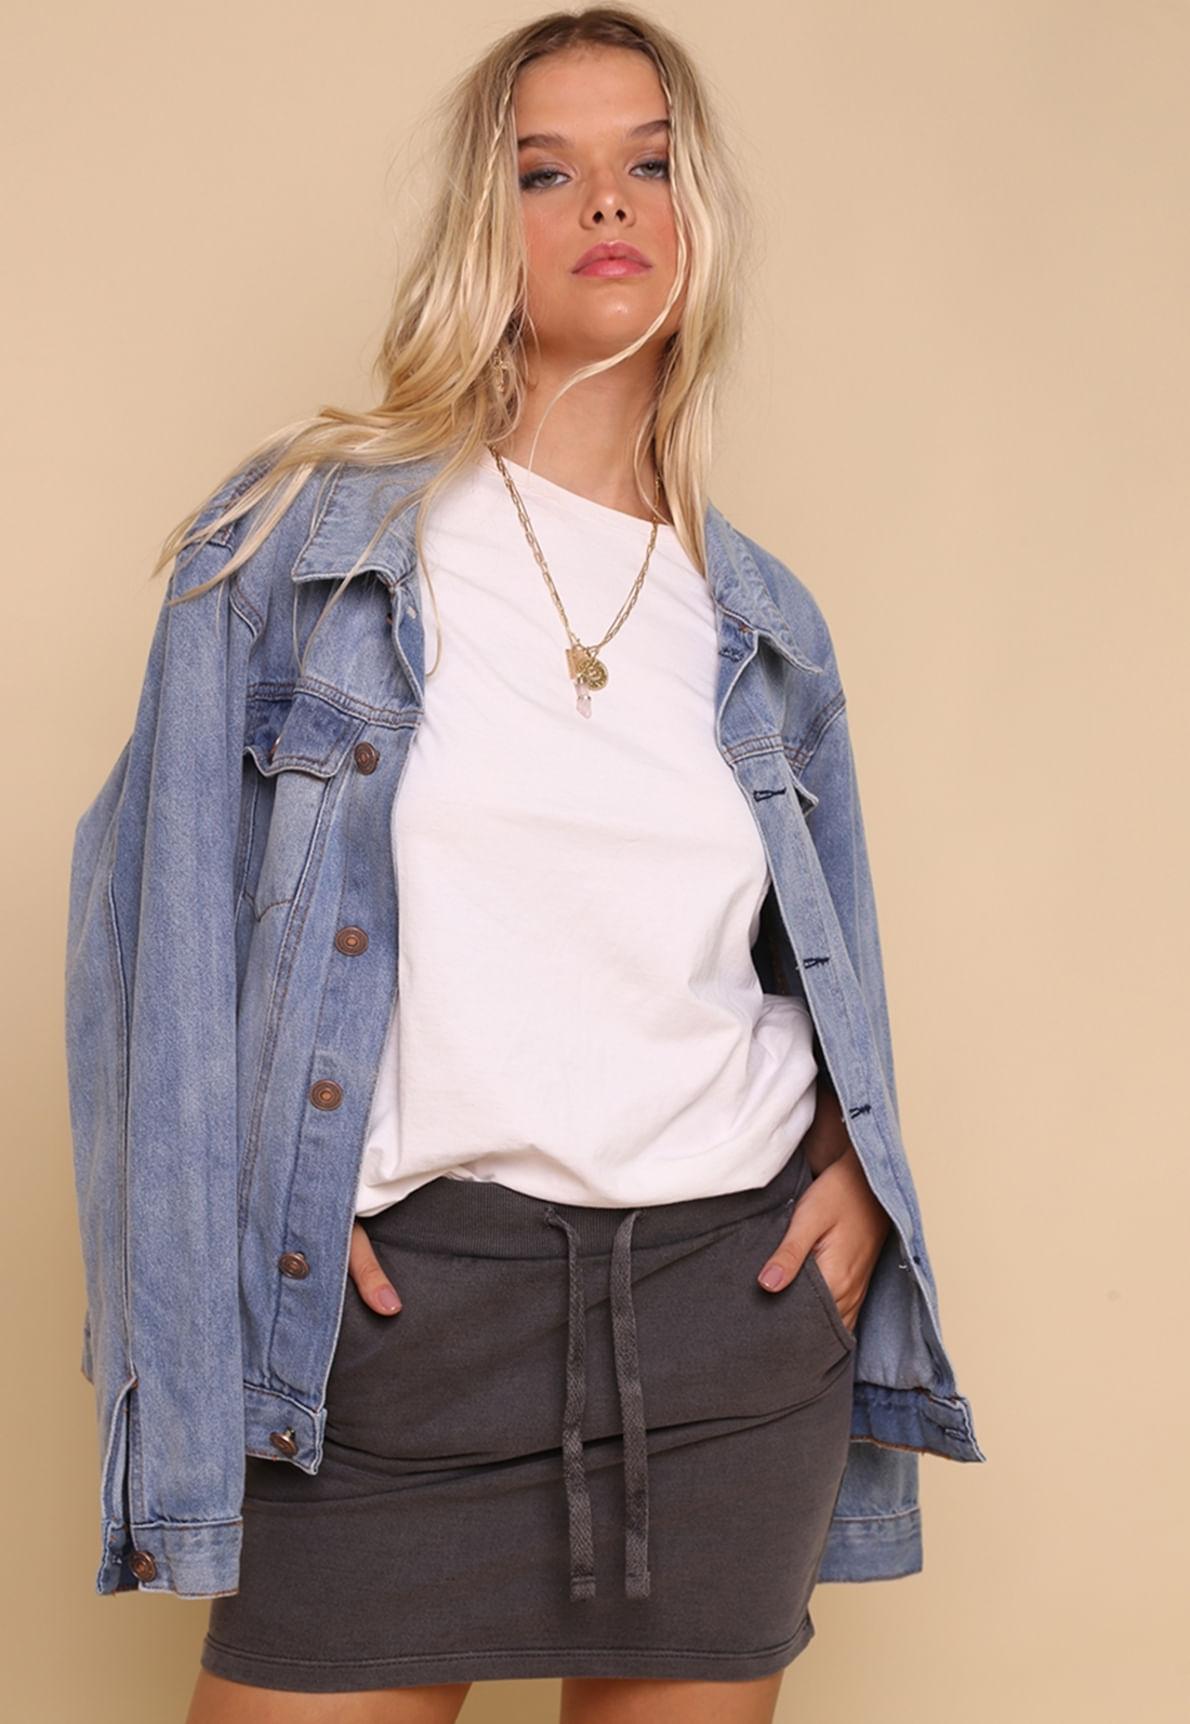 17709-t-shirt-basica-branca-lolita-pop-mundo-lolita-01